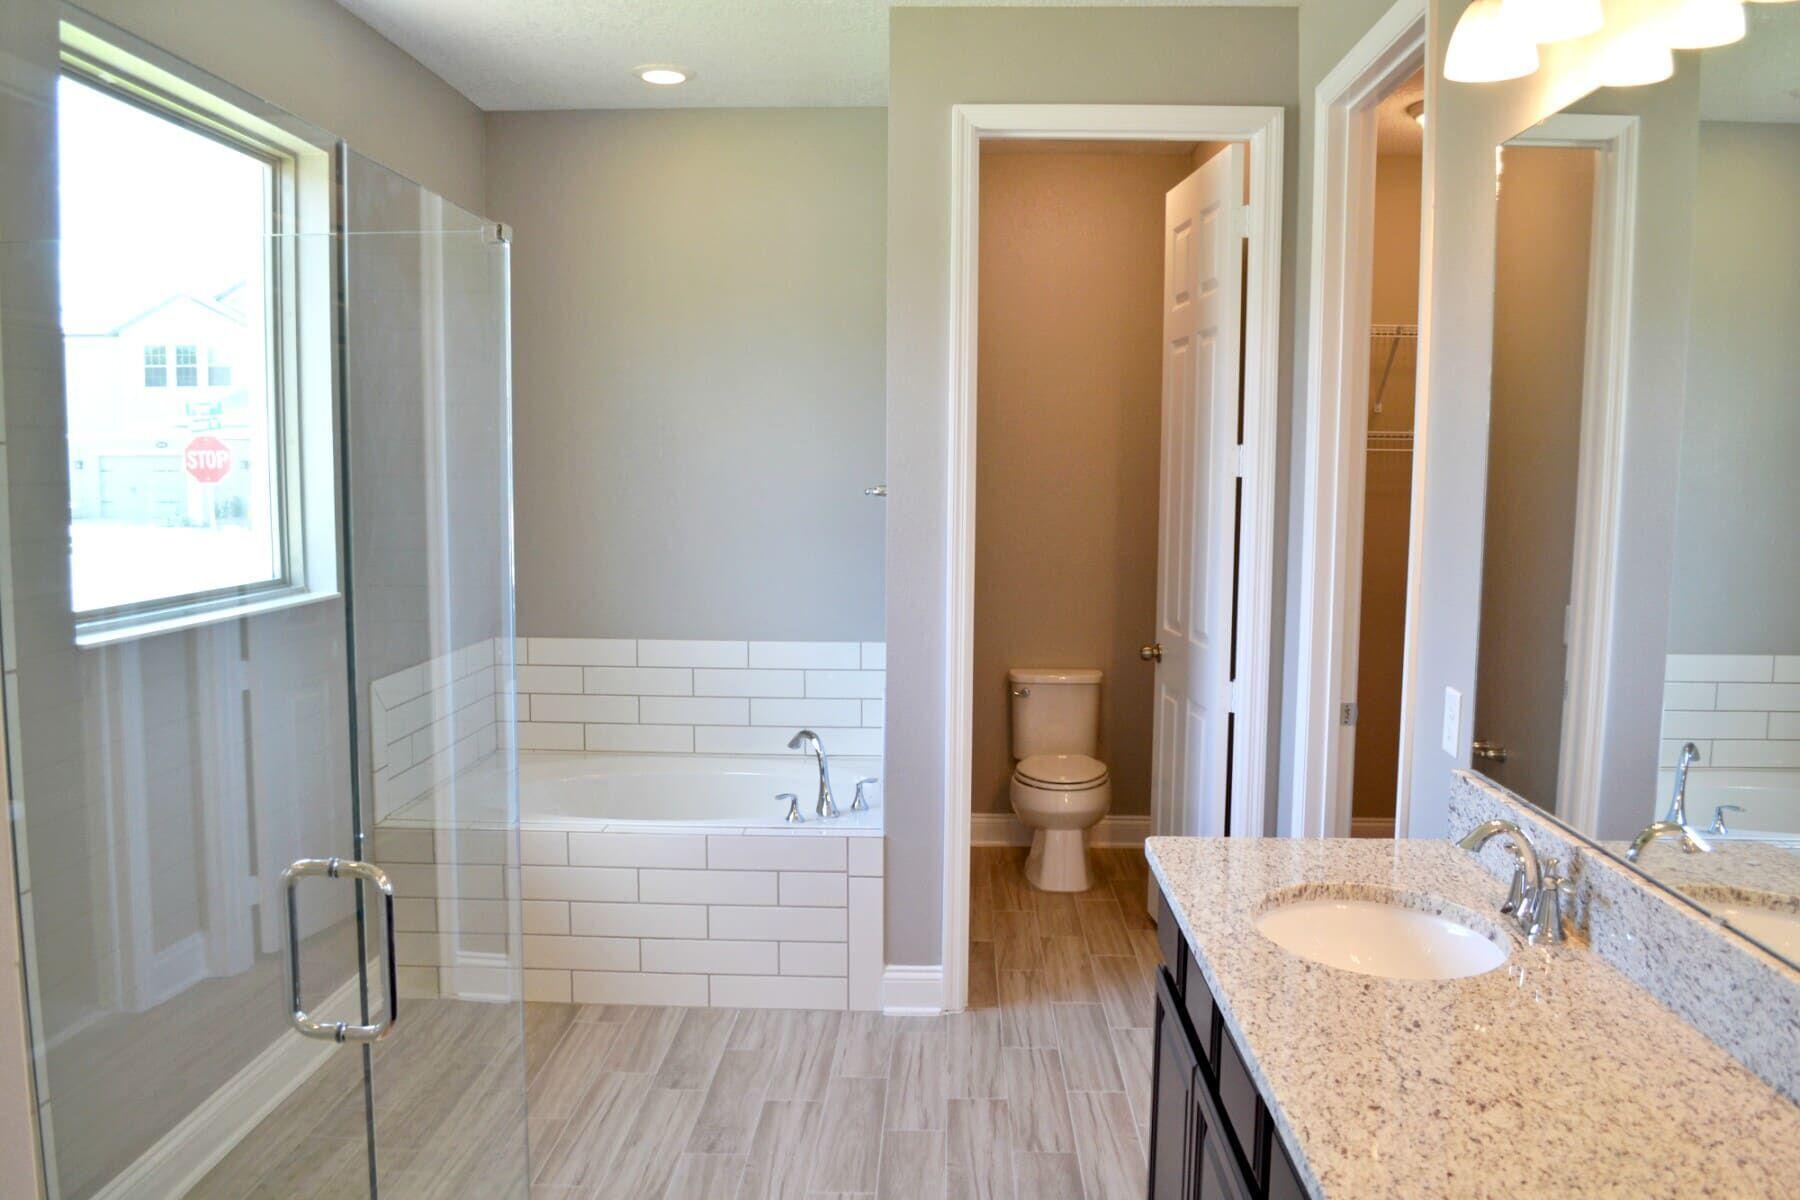 Bathroom featured in the Savannah Fl By M/I Homes in Orlando, FL